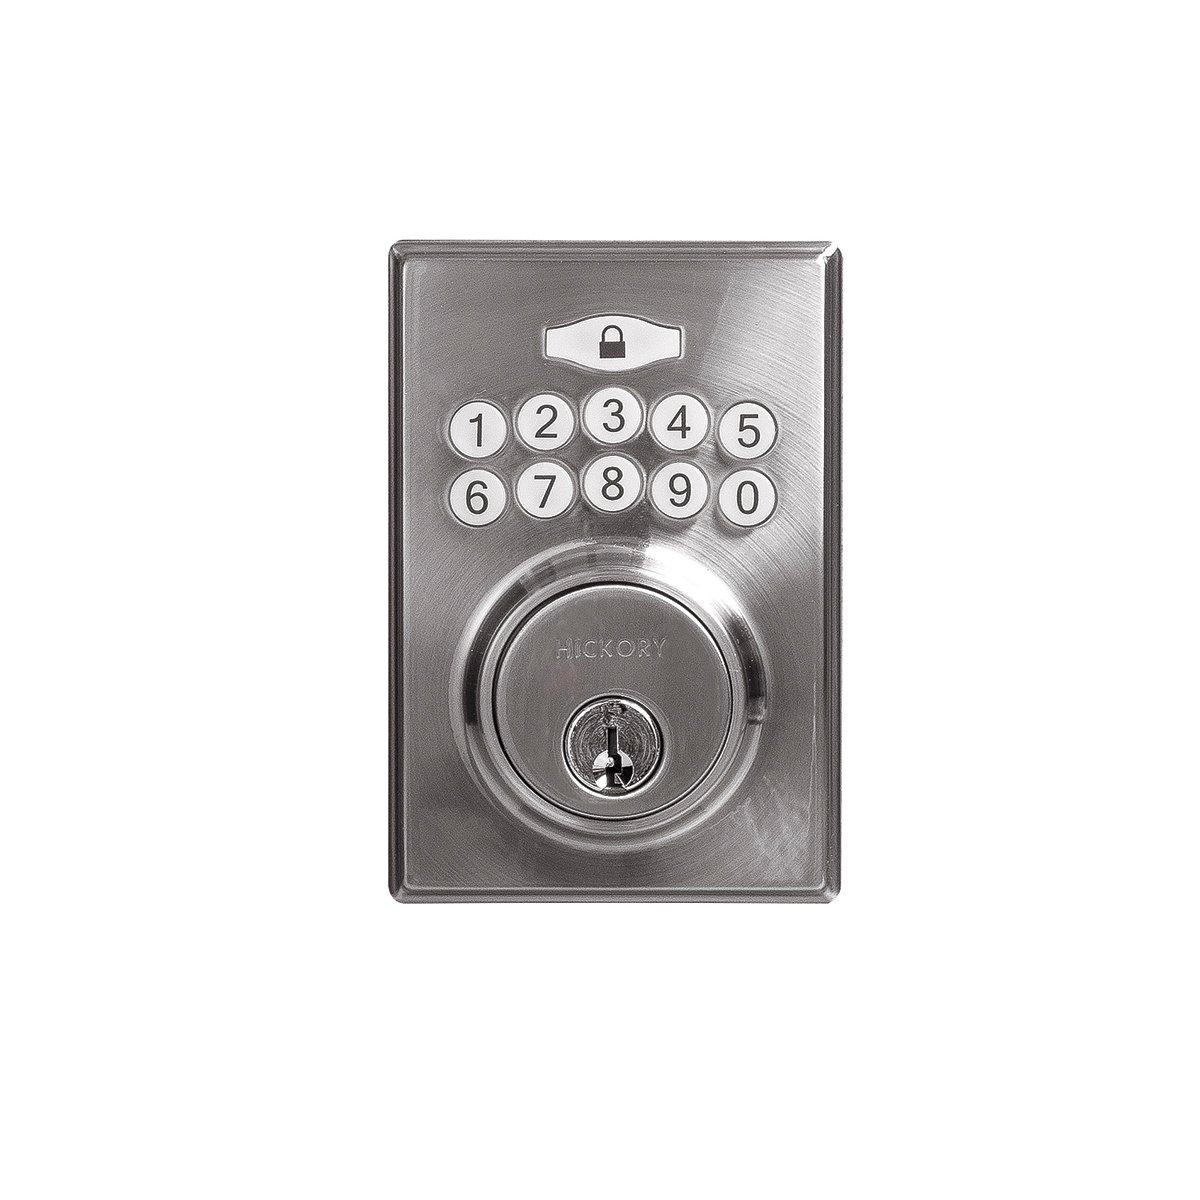 Hickory Hardware H076389-SN Securemote Bluetooth Enabled Deadbolt Satin Nickel